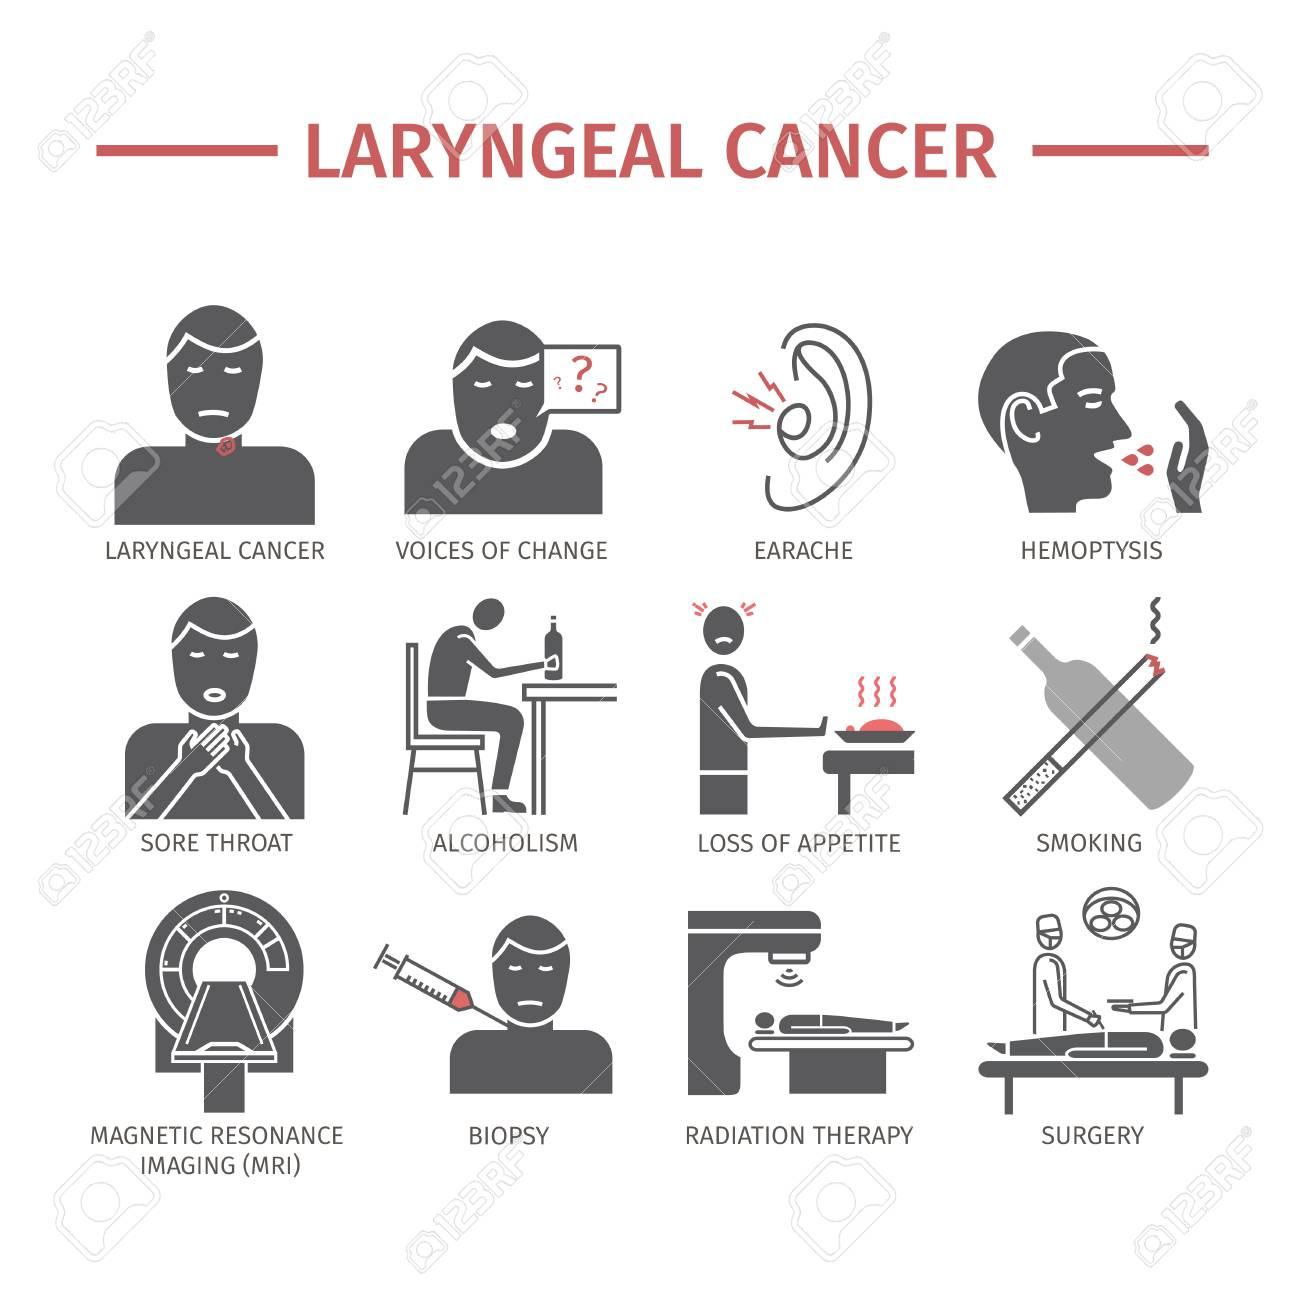 endometrial cancer tumor markers